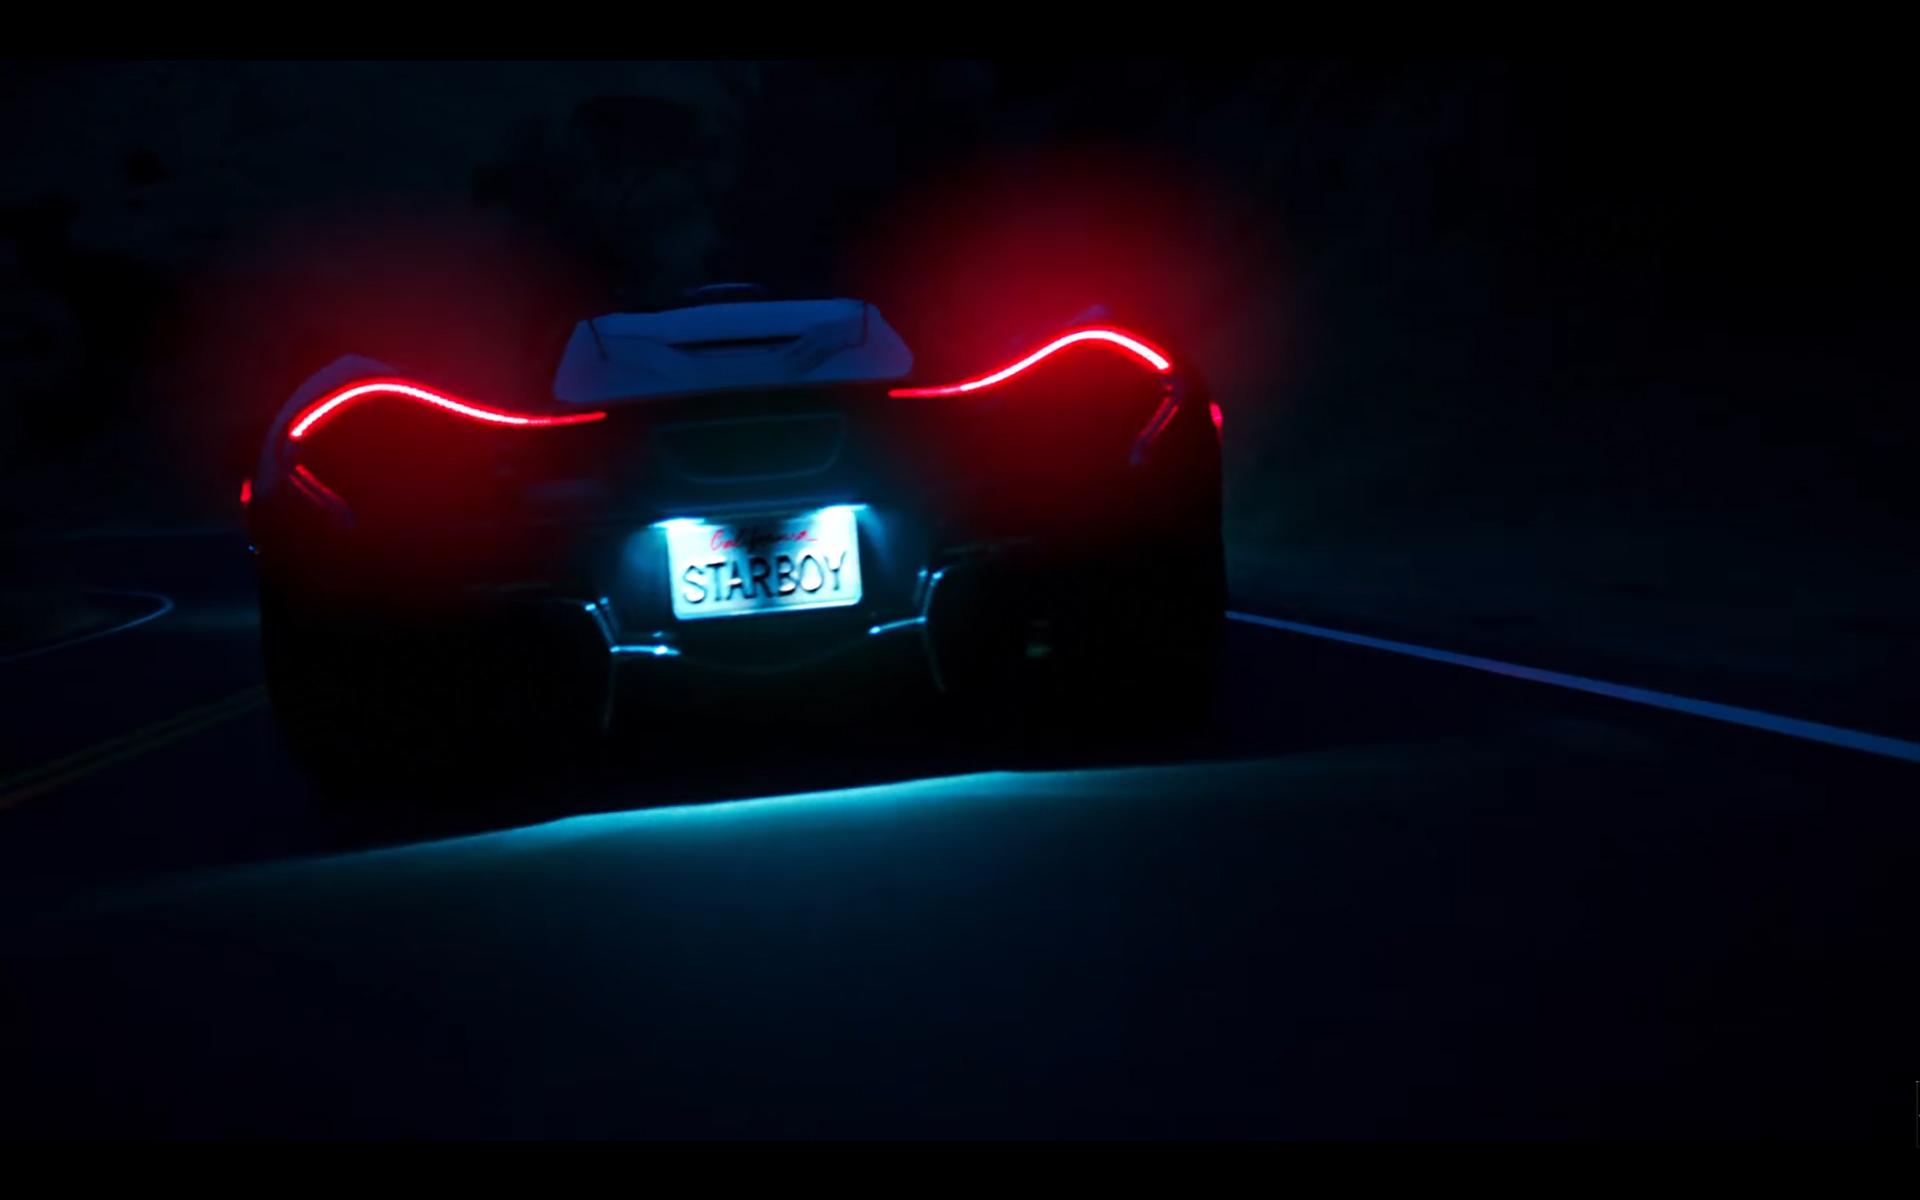 Starboy - The Weeknd - McLaren P1 - rear lights